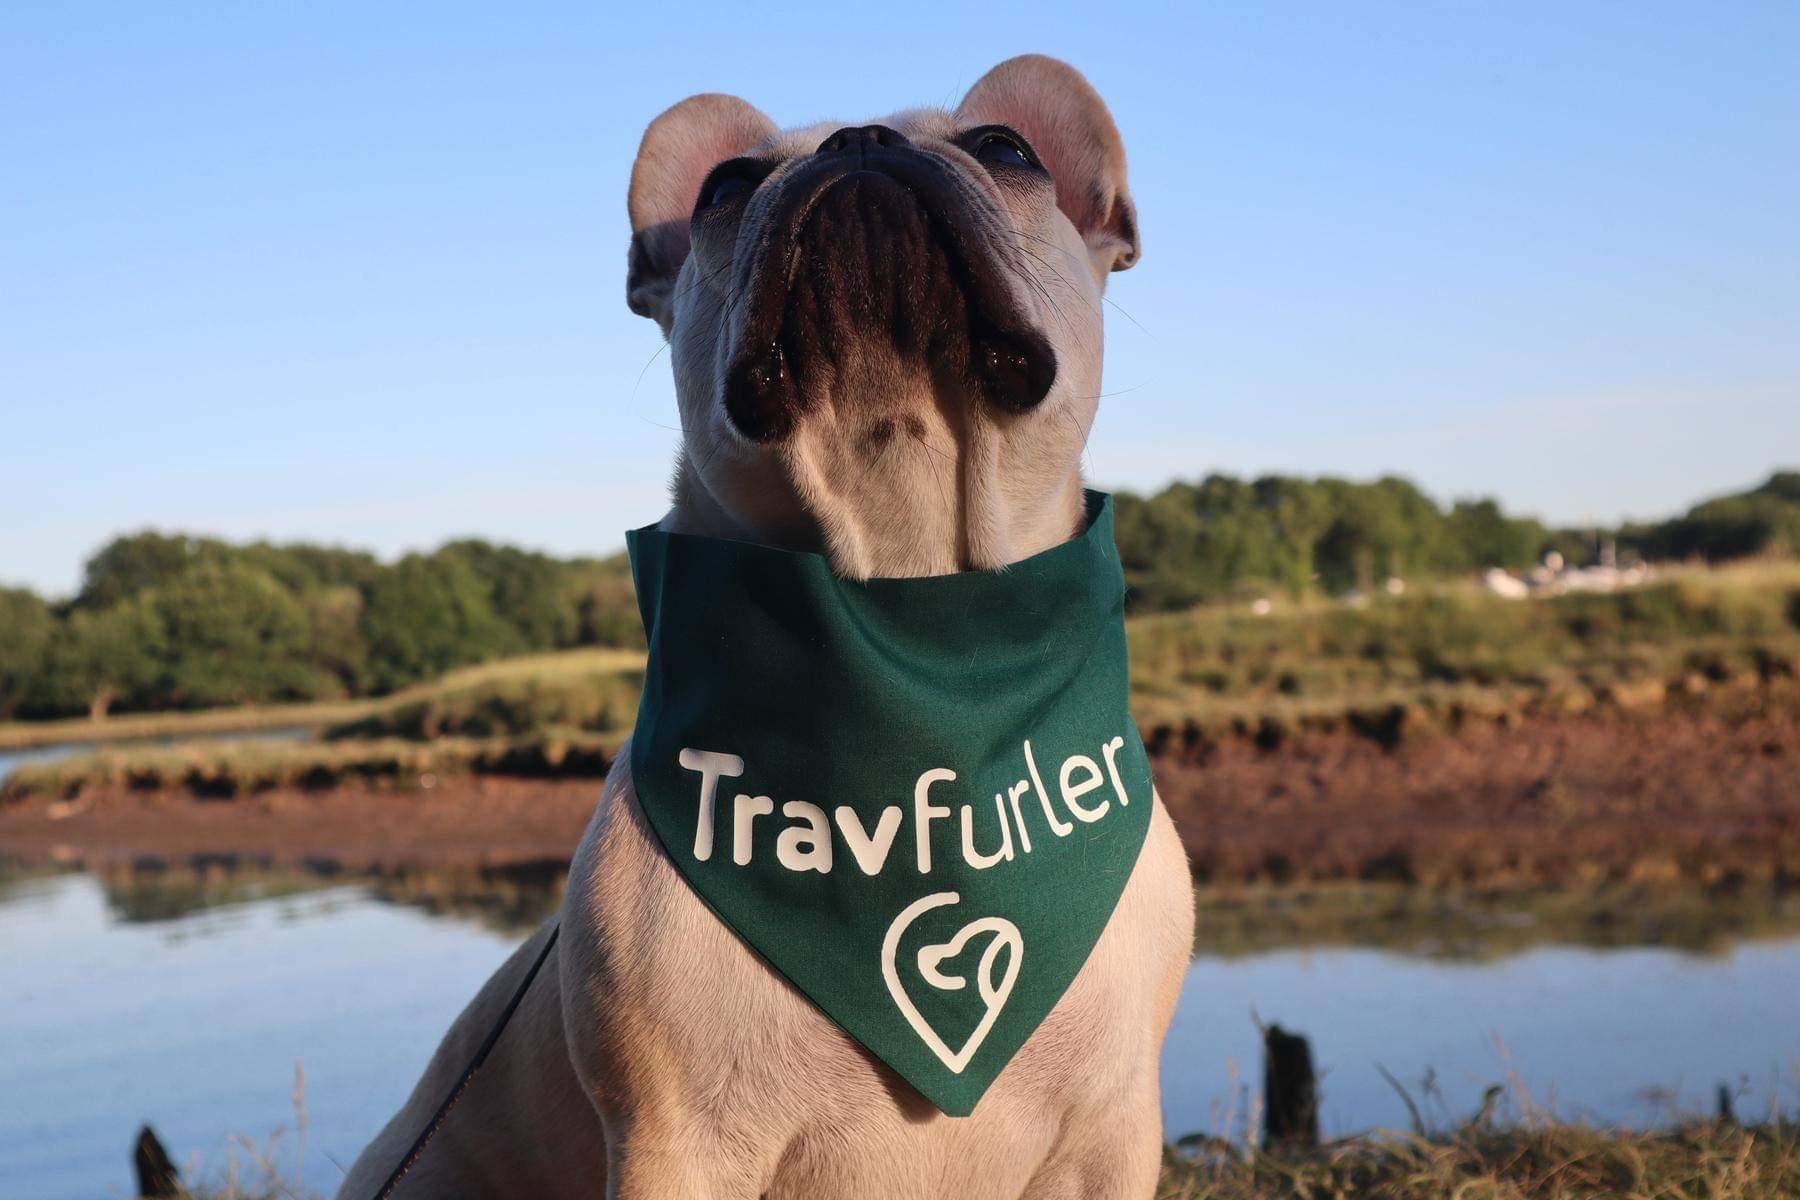 Travfurler – The Pet Travel Gear You Need